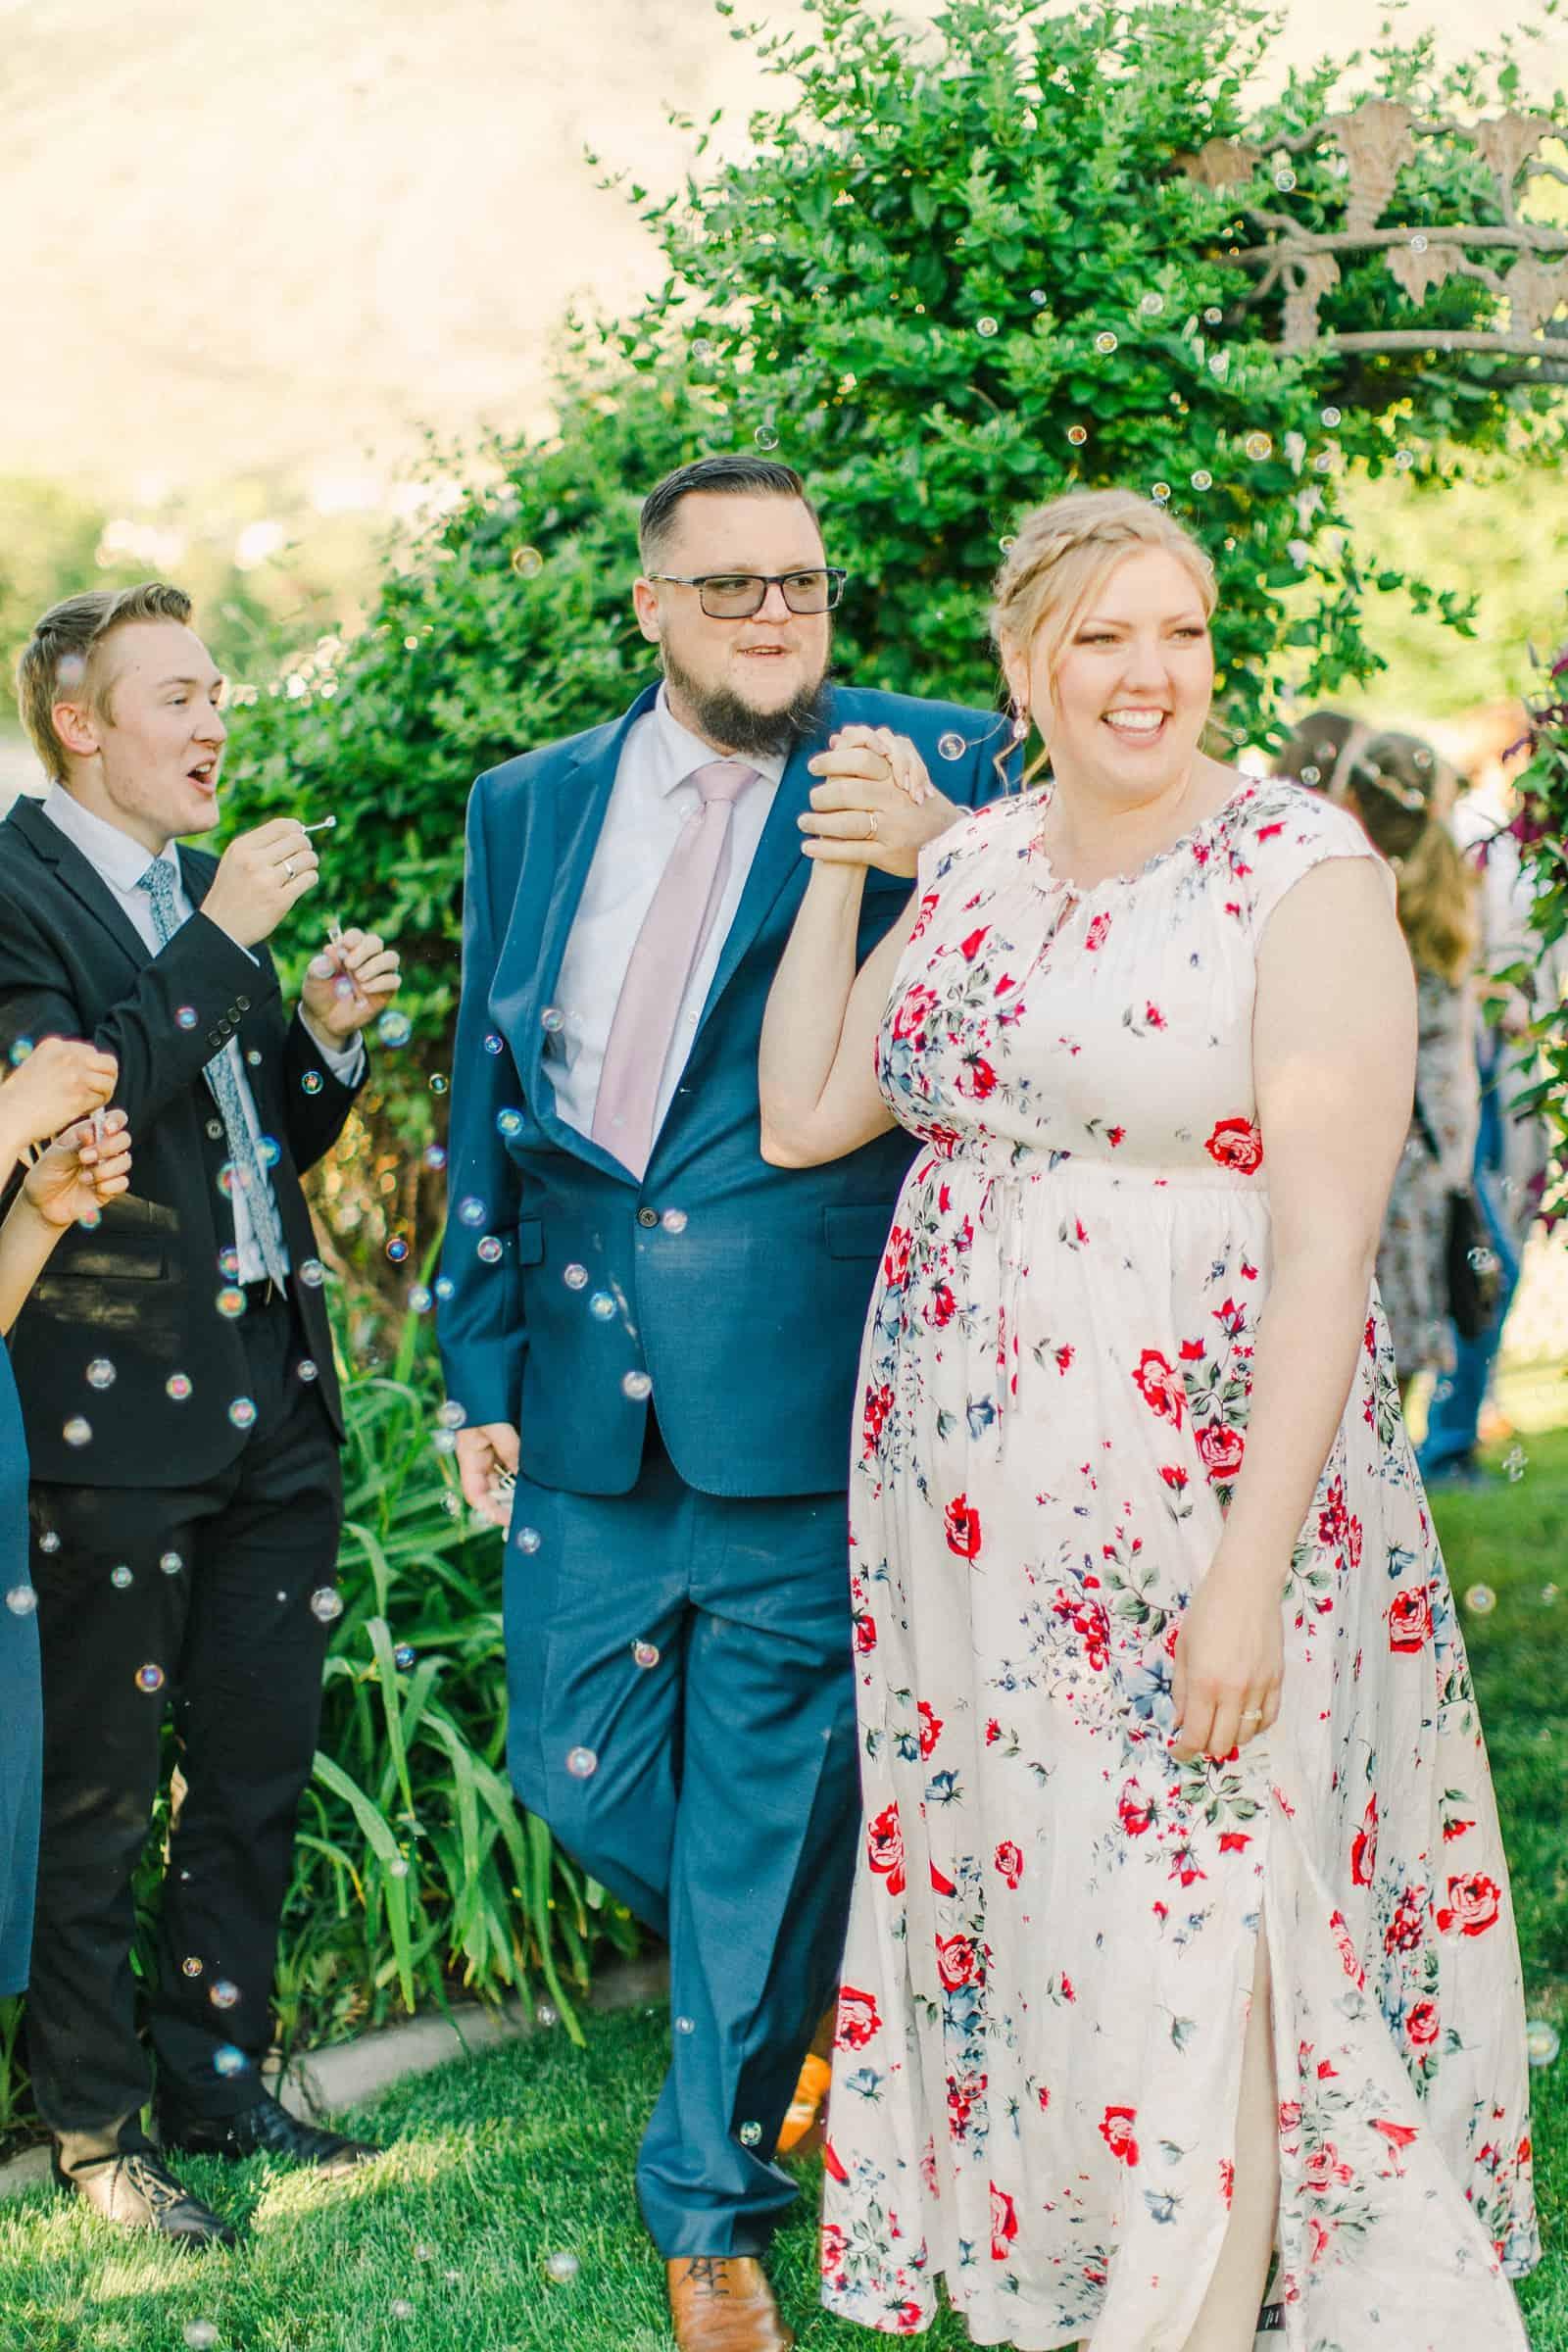 Draper LDS Temple Wedding, Utah wedding photography, summer backyard wedding, bride and groom grand send off exit bubbles